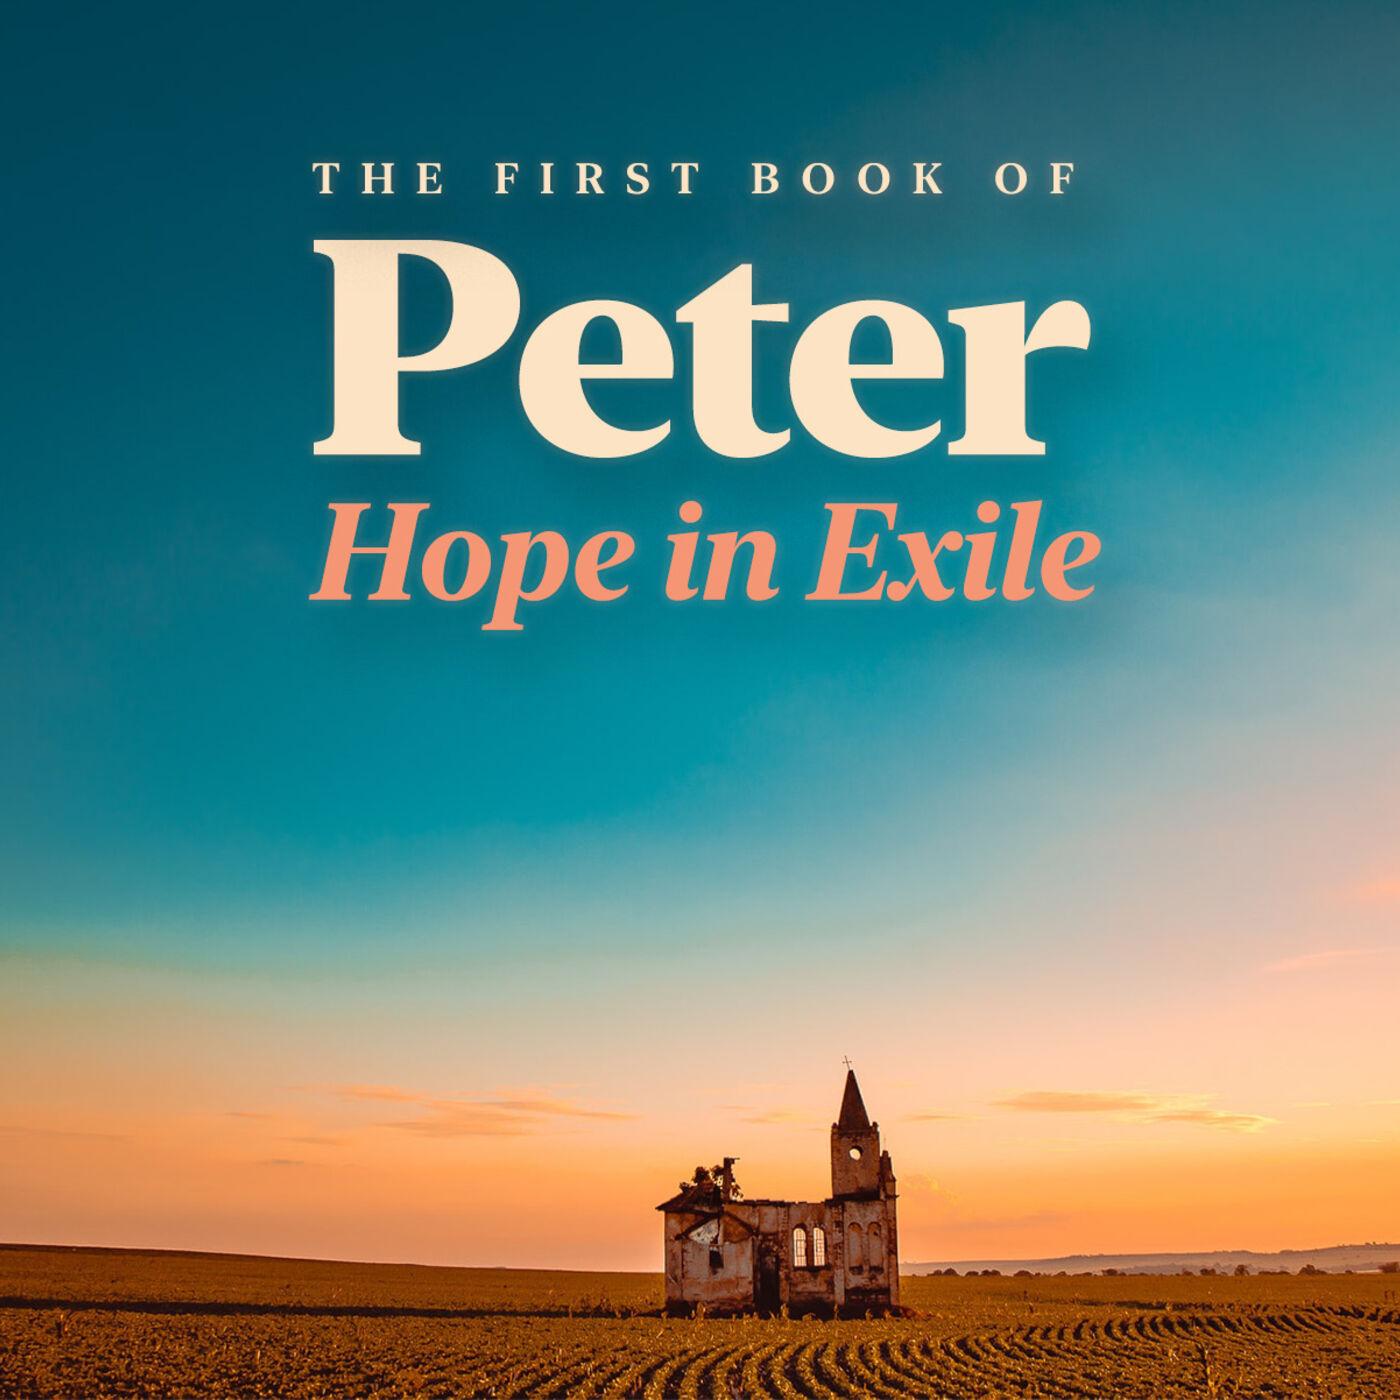 1 Peter 1:22 - 2:12 | Pastor Dale Stinson